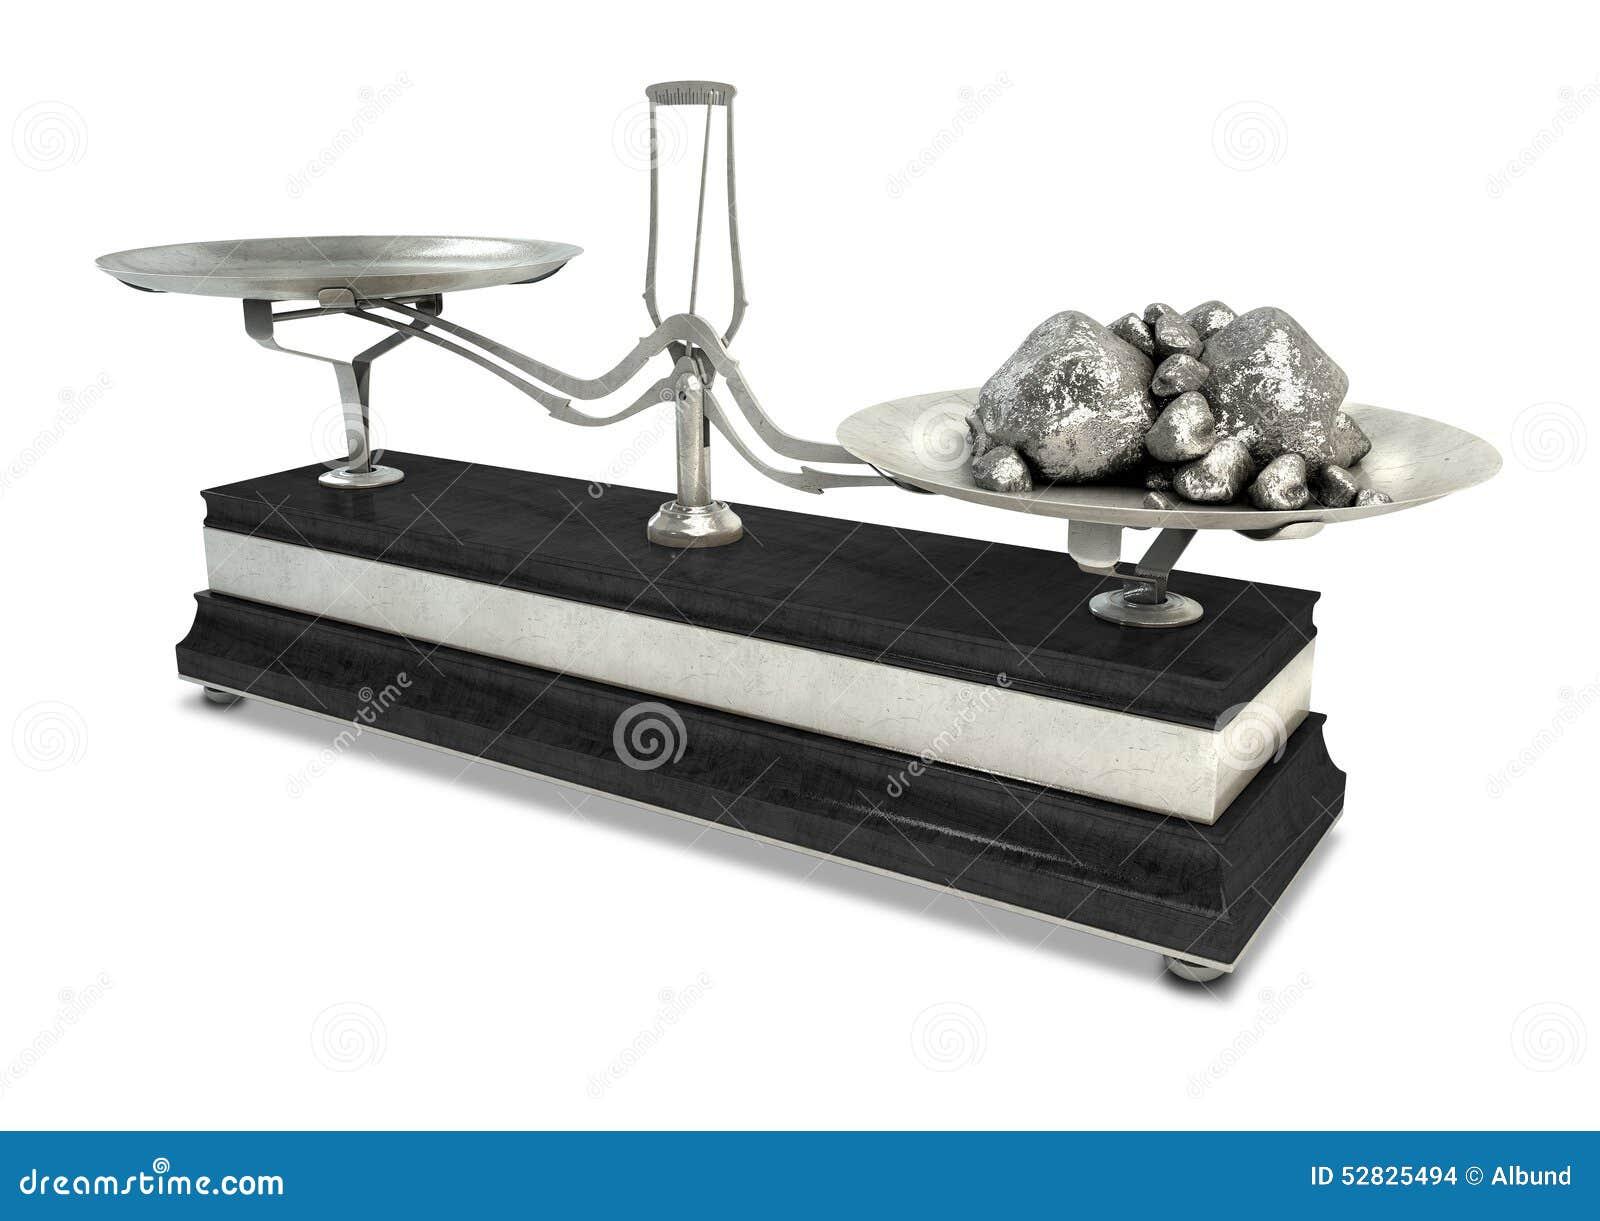 pan balance scale - photo #3